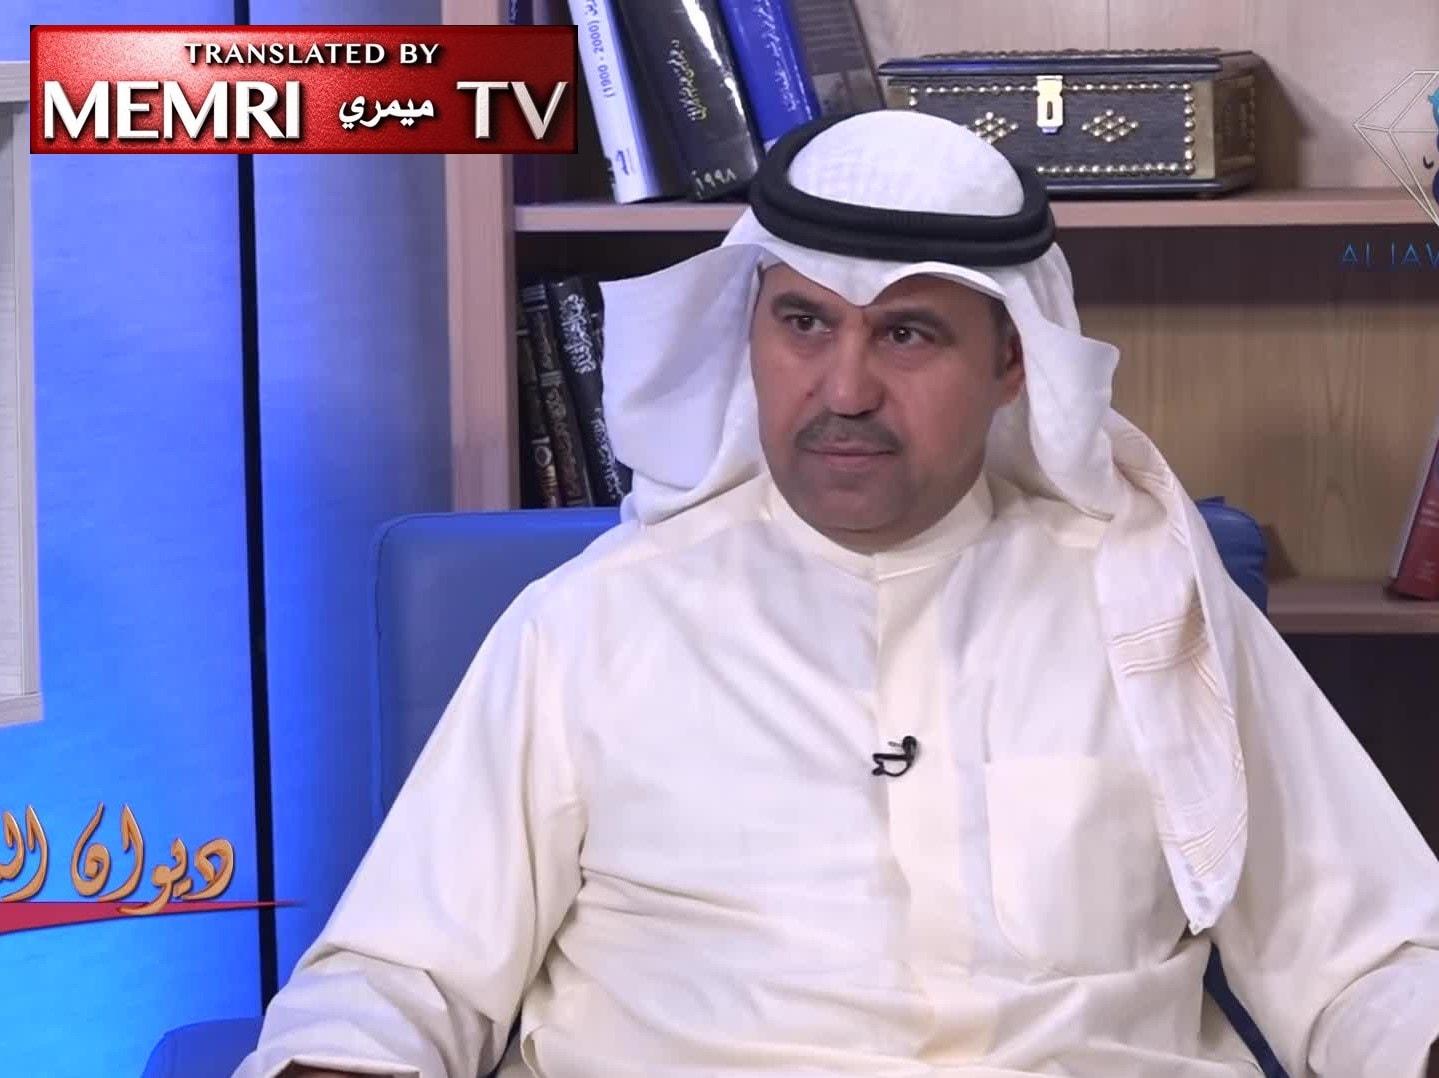 Kuwait | Page 3 | MEMRI TV